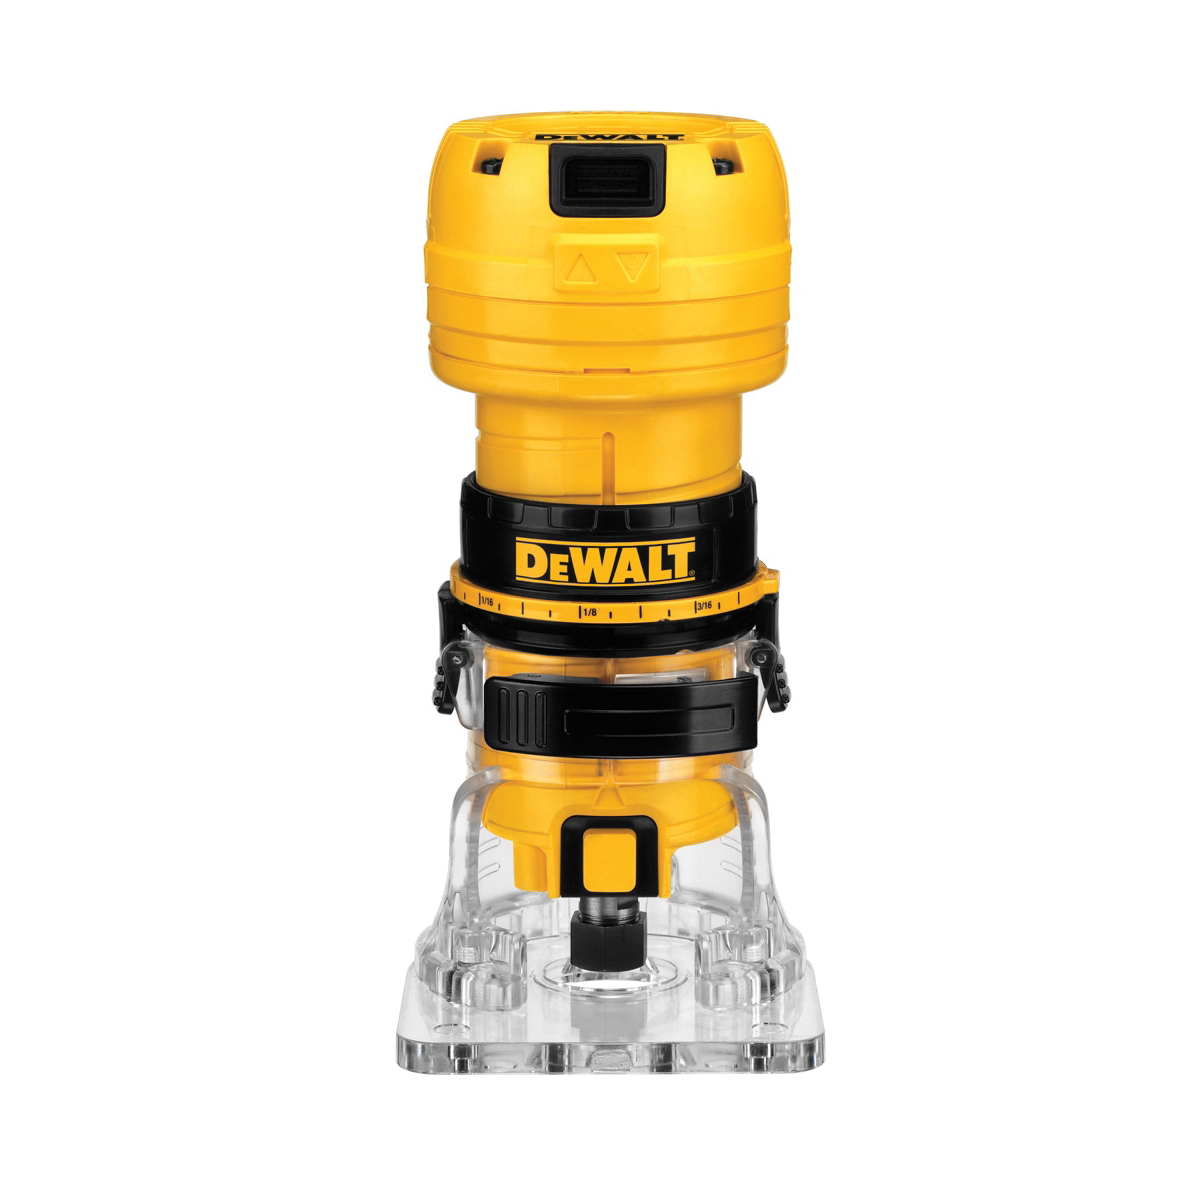 DeWALT® DWE6000 Laminate Trimmer, Toggle Switch, 1/4 in Chuck, 31000 rpm Speed, 7/8 hp, 120 VAC